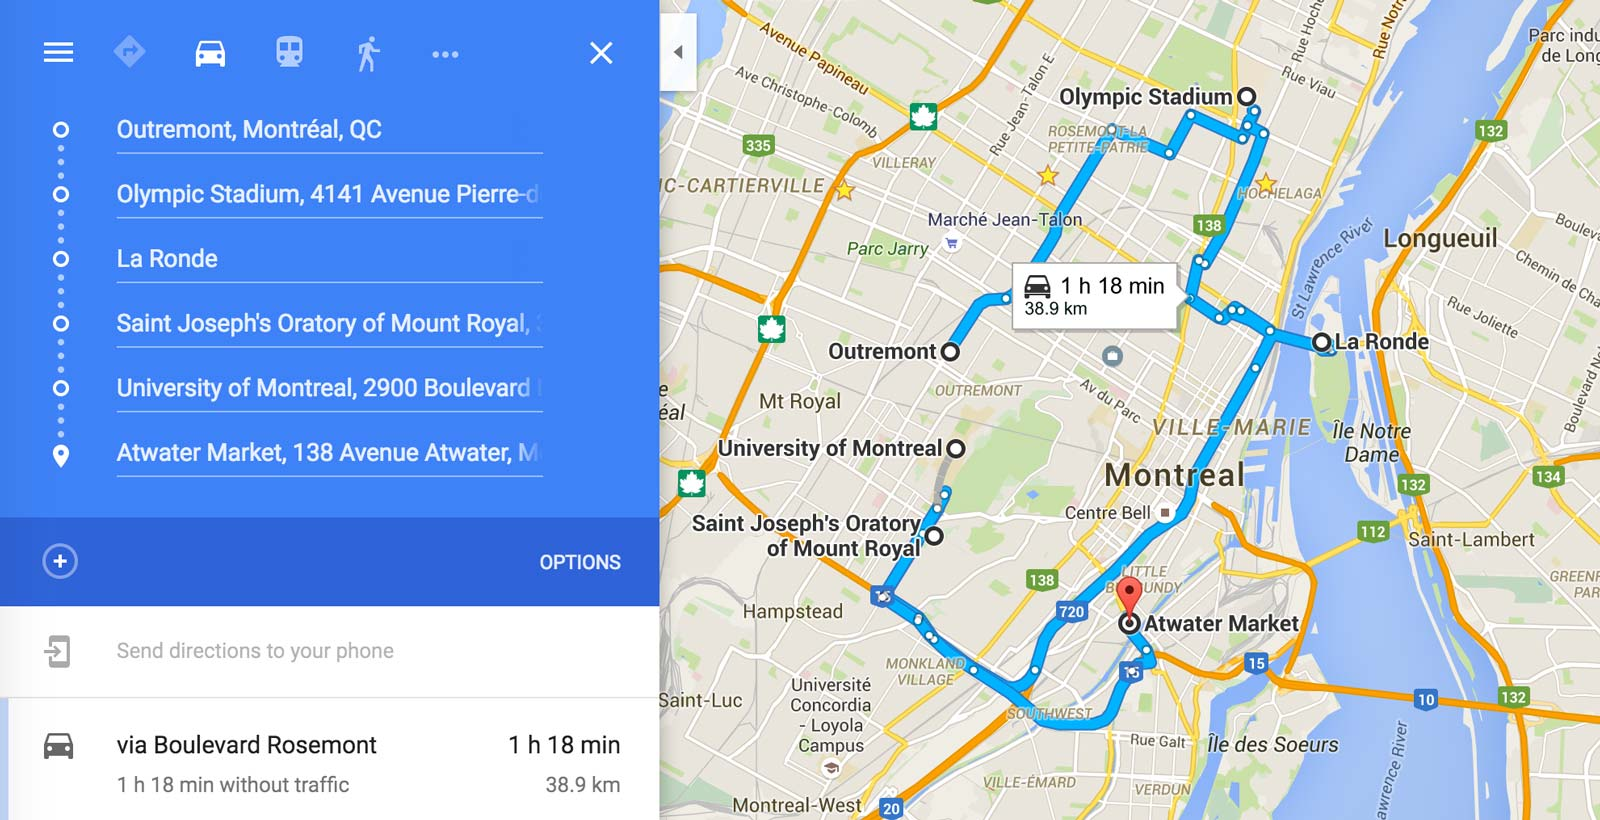 Google Maps sur Android permet les itinéraires avec de ... on iphone maps, topographic maps, gppgle maps, road map usa states maps, ipad maps, goolge maps, bing maps, aeronautical maps, googie maps, microsoft maps, android maps, msn maps, amazon fire phone maps, googlr maps, search maps, stanford university maps, online maps, waze maps, aerial maps, gogole maps,